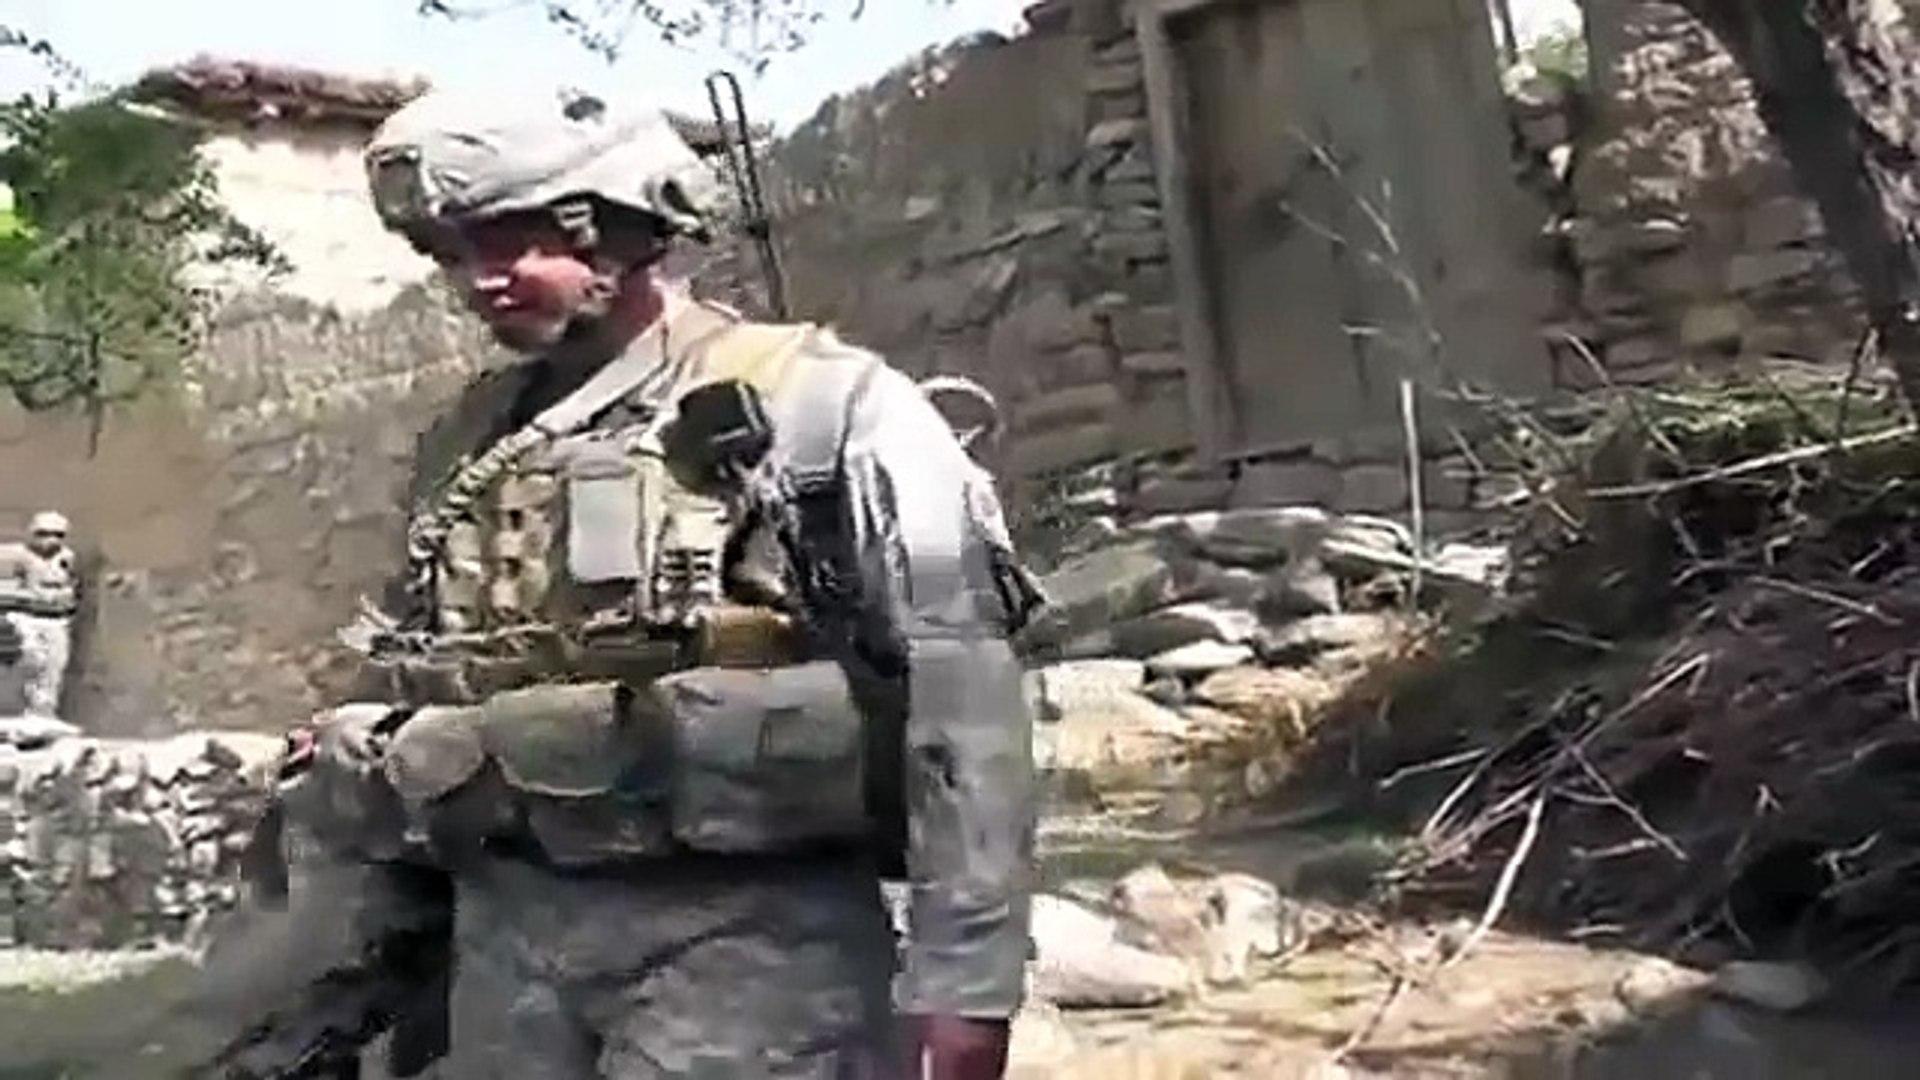 Ambush - soldier shot in head